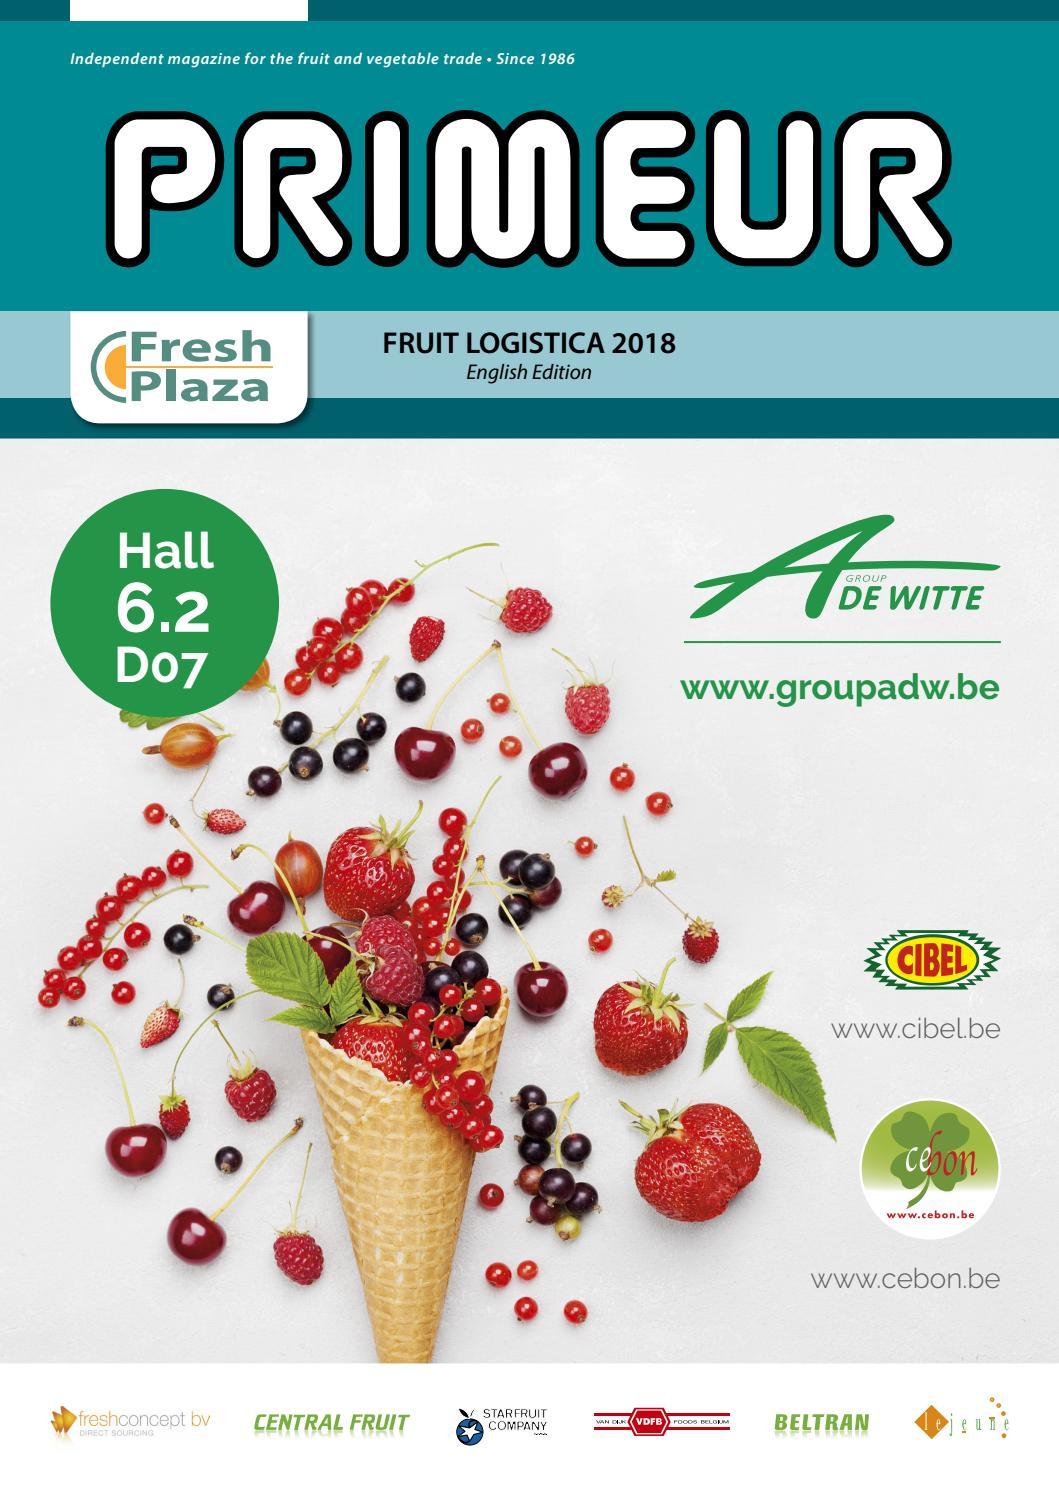 Giant Red Globe Grape Vine Fruit Plant Seeds 13 Seeds Uk Stock BUY 2 GET 1 FREE